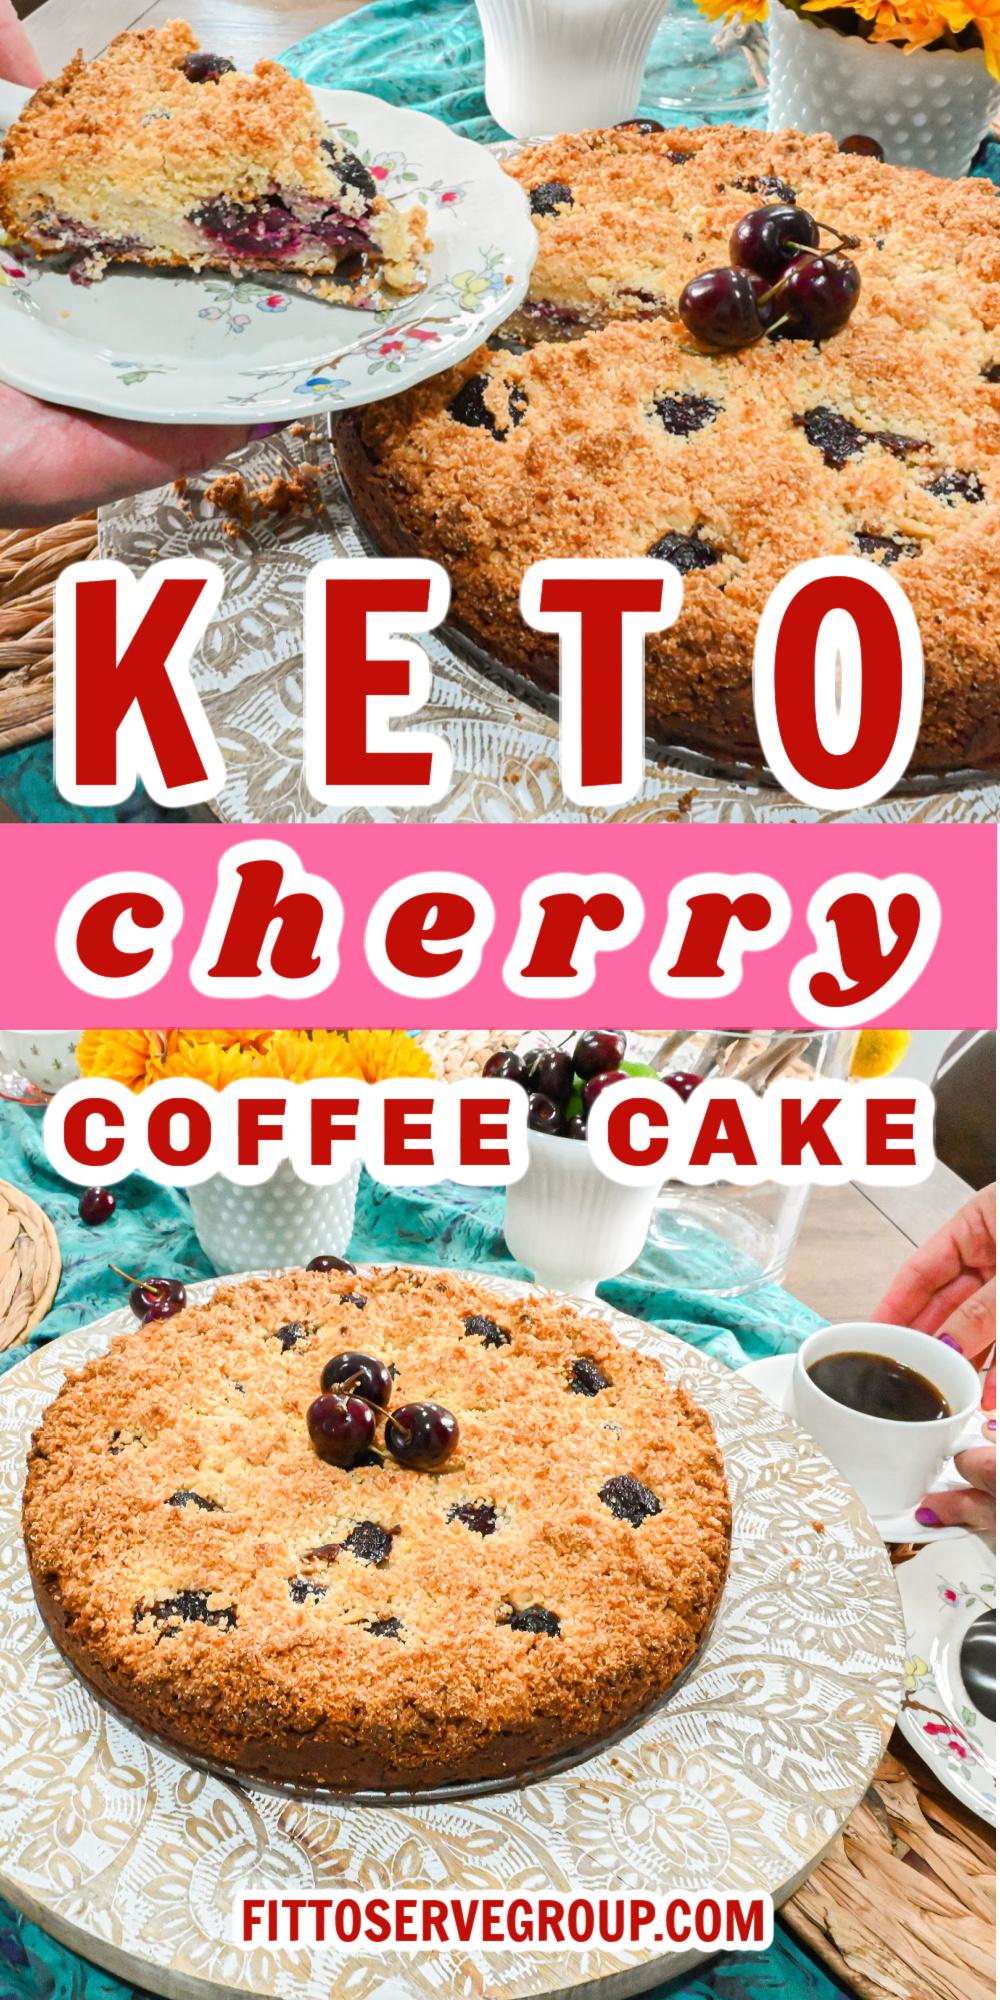 Keto Cherry Coffee Cake Pin